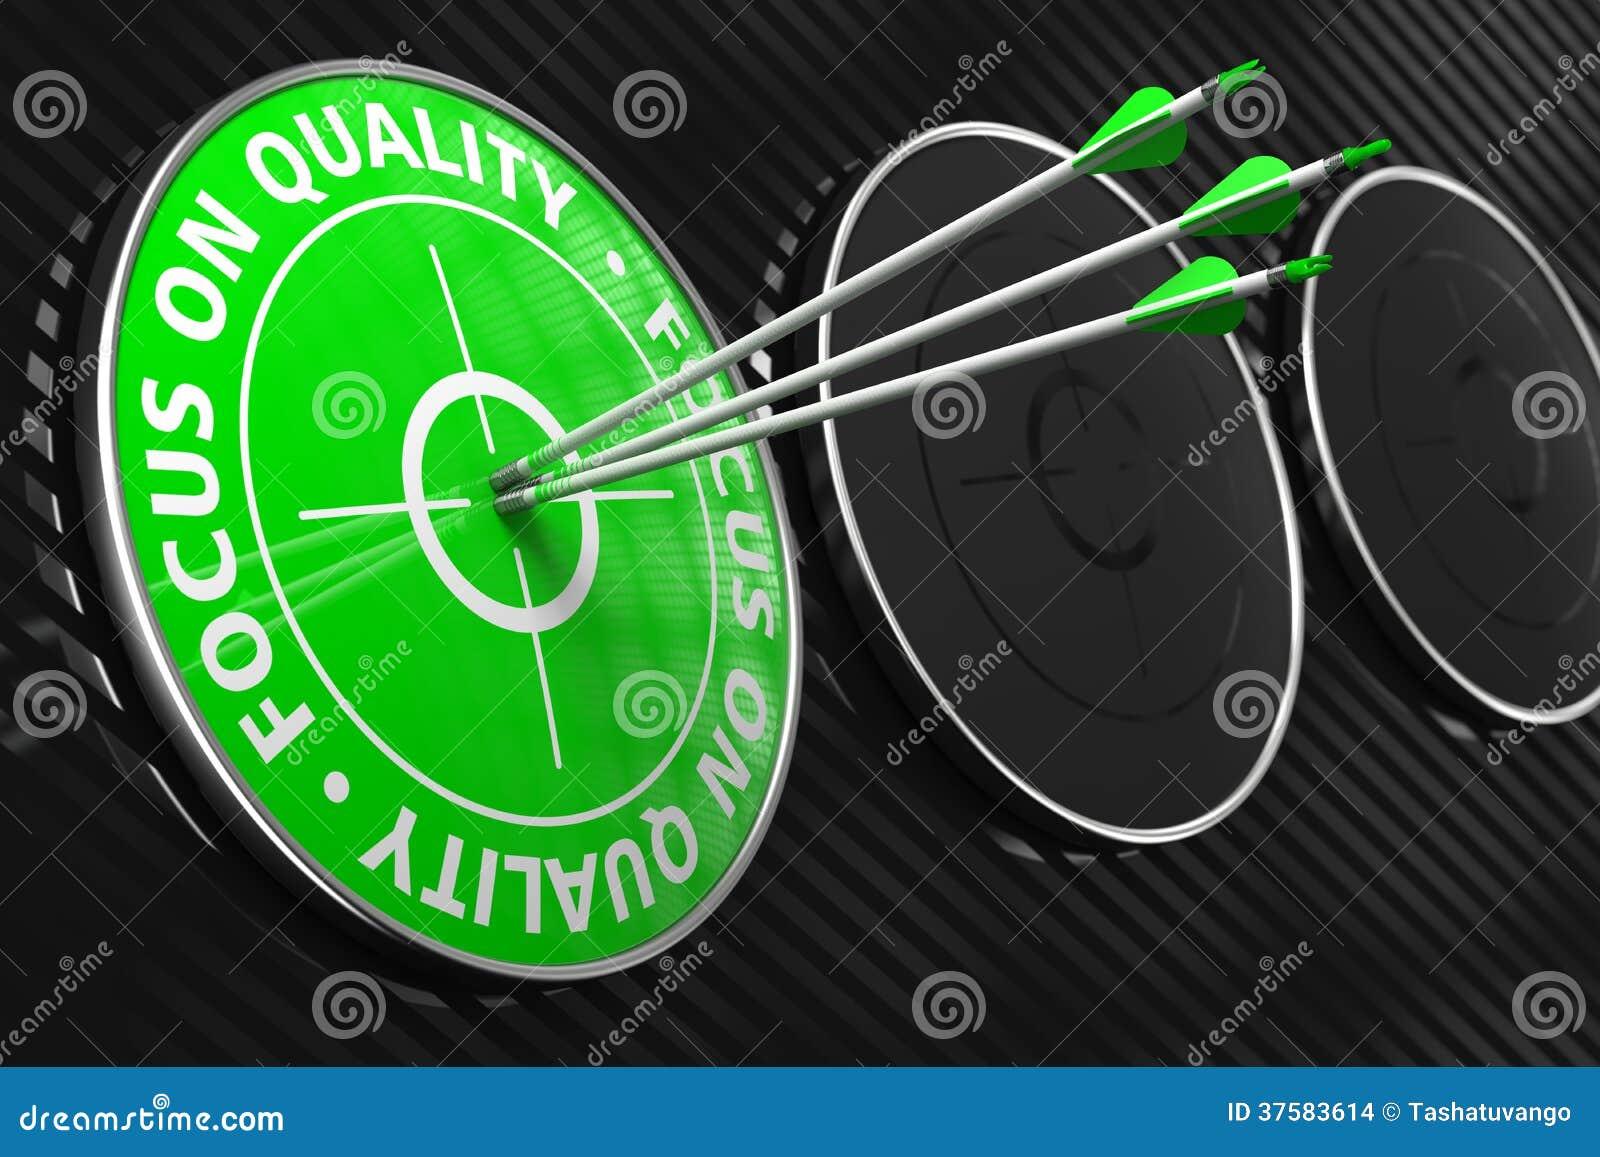 Focus On Quality Slogan Green Target Stock Illustration